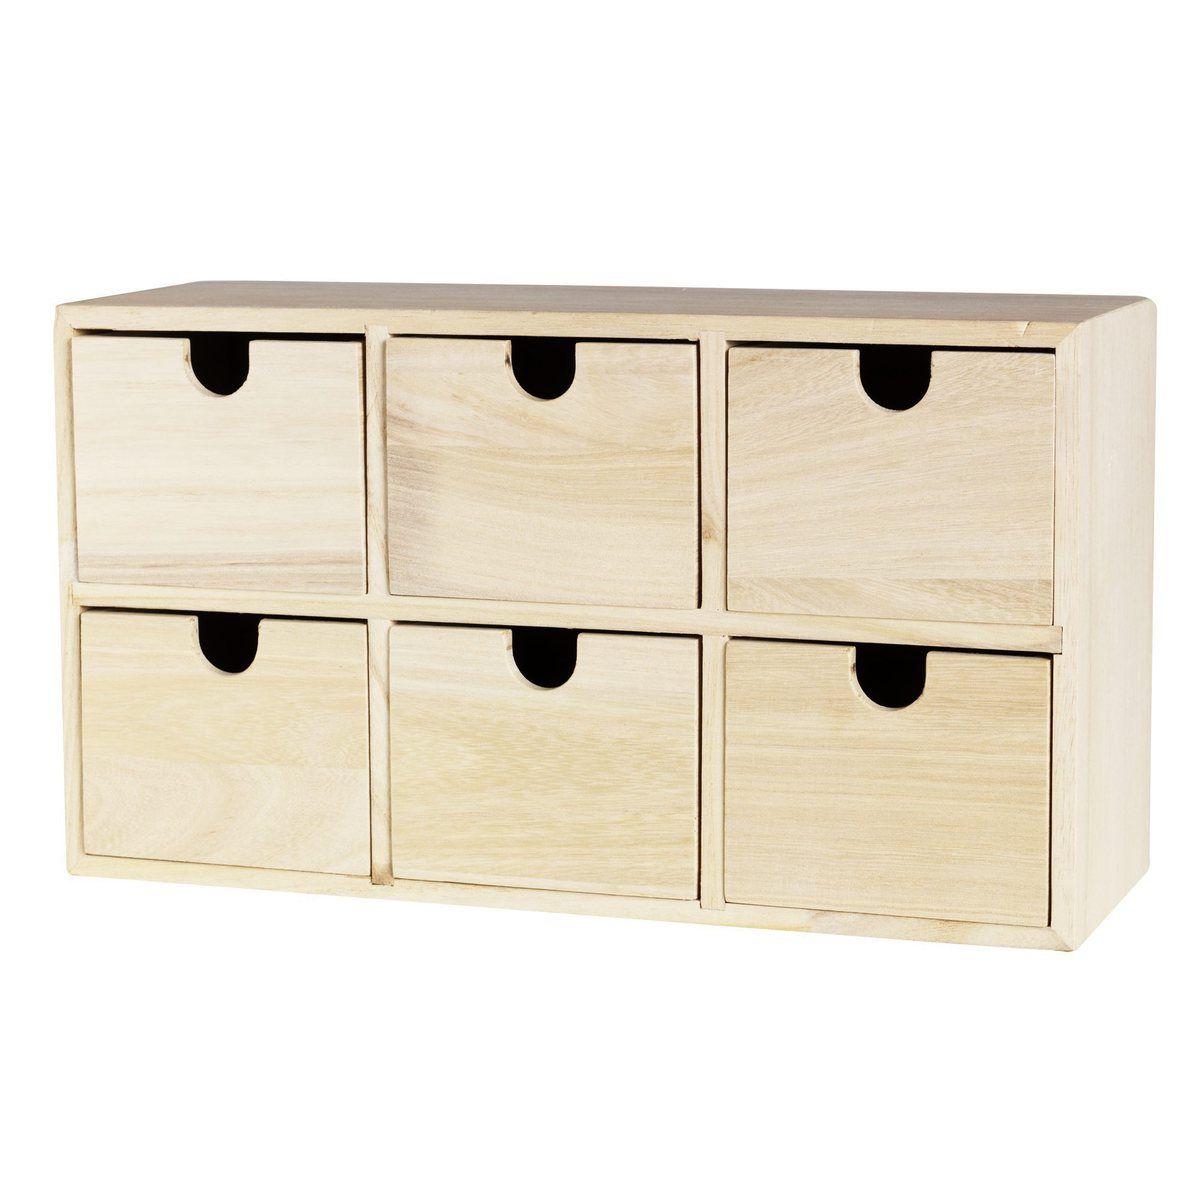 Minikommode Ikea Kchenmbel Ikea Simple Nobilia Kche Online Planen